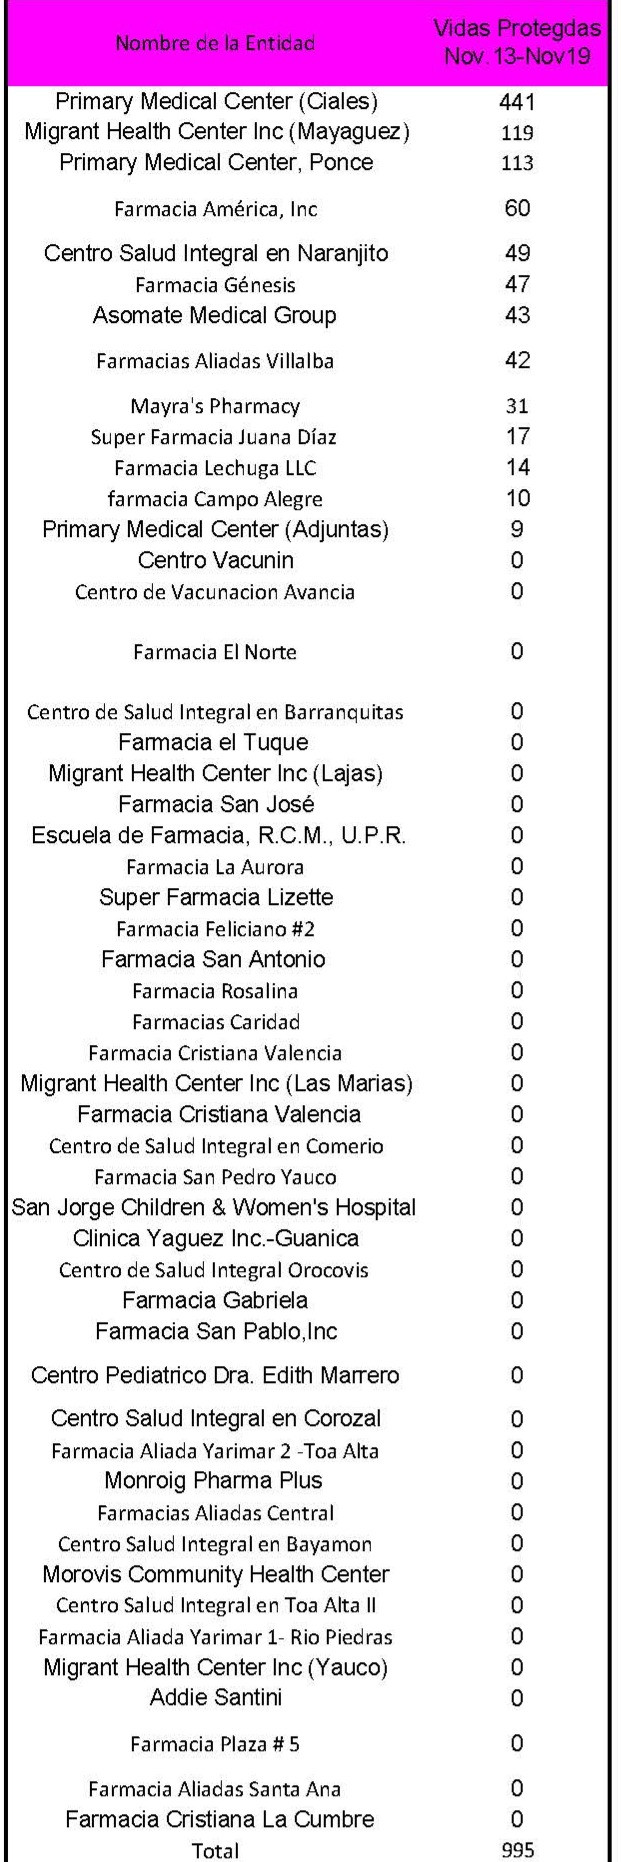 Semana 18 #prcontrala influenza